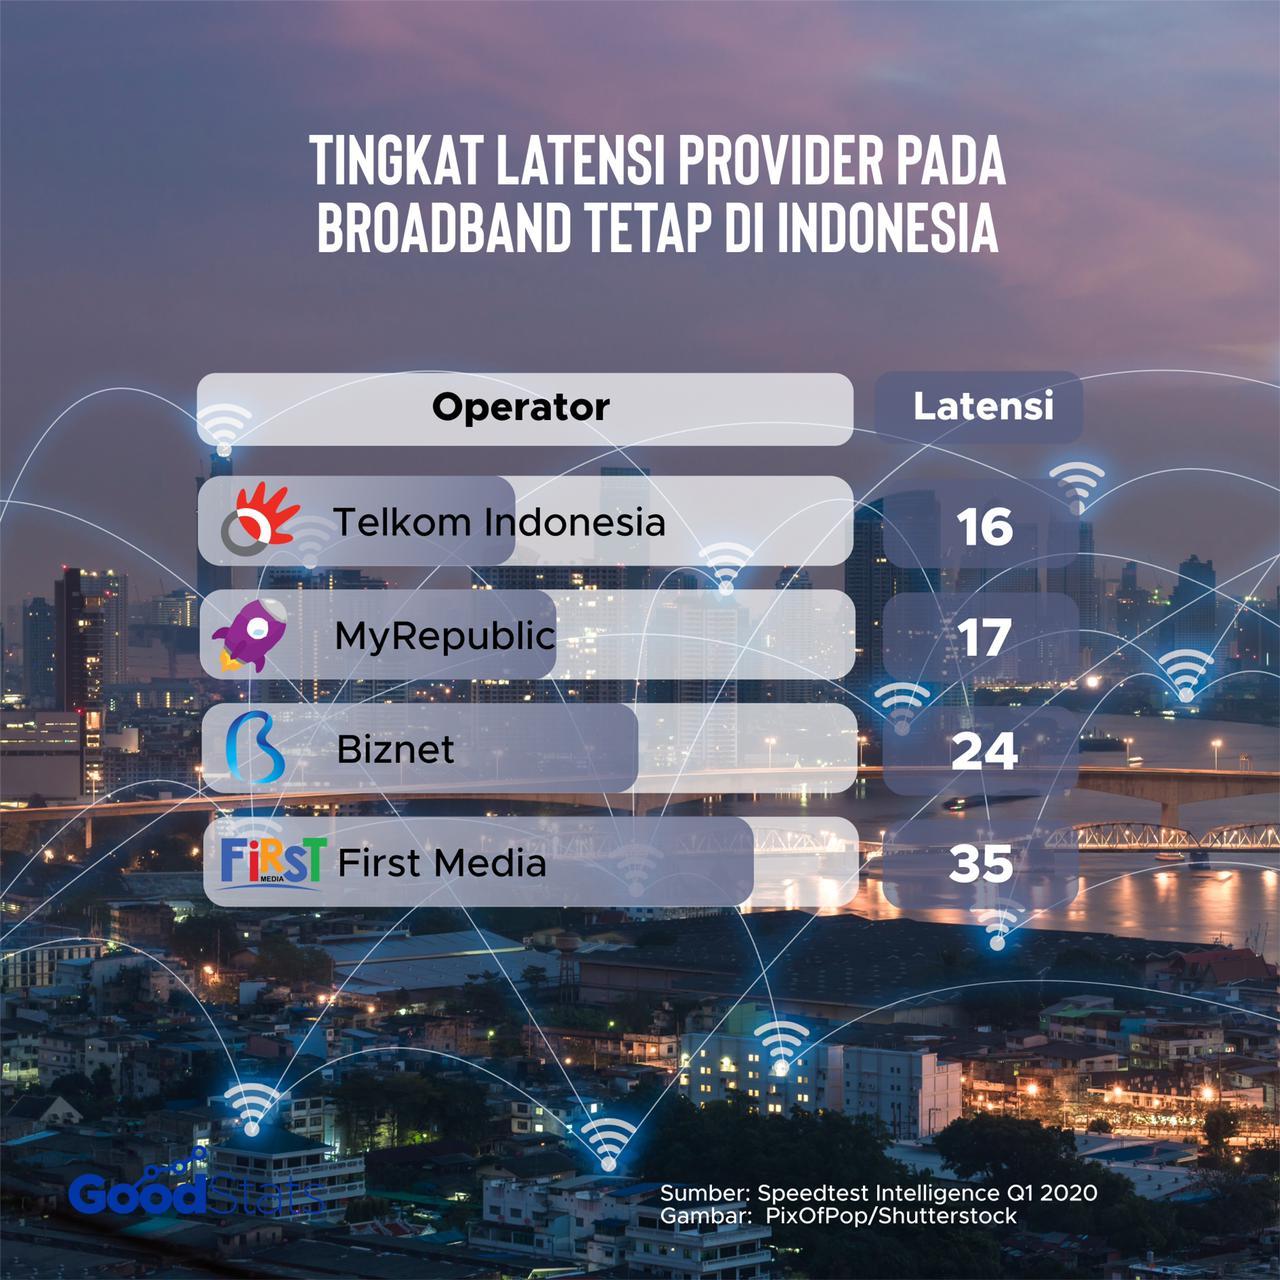 Telkom Indonesia menjadi provider dengan latensi terendah pada fixed broadband di Indonesia. Telkom Indonesia tercatat memiliki latensi 16 mili detik. | GoodStats